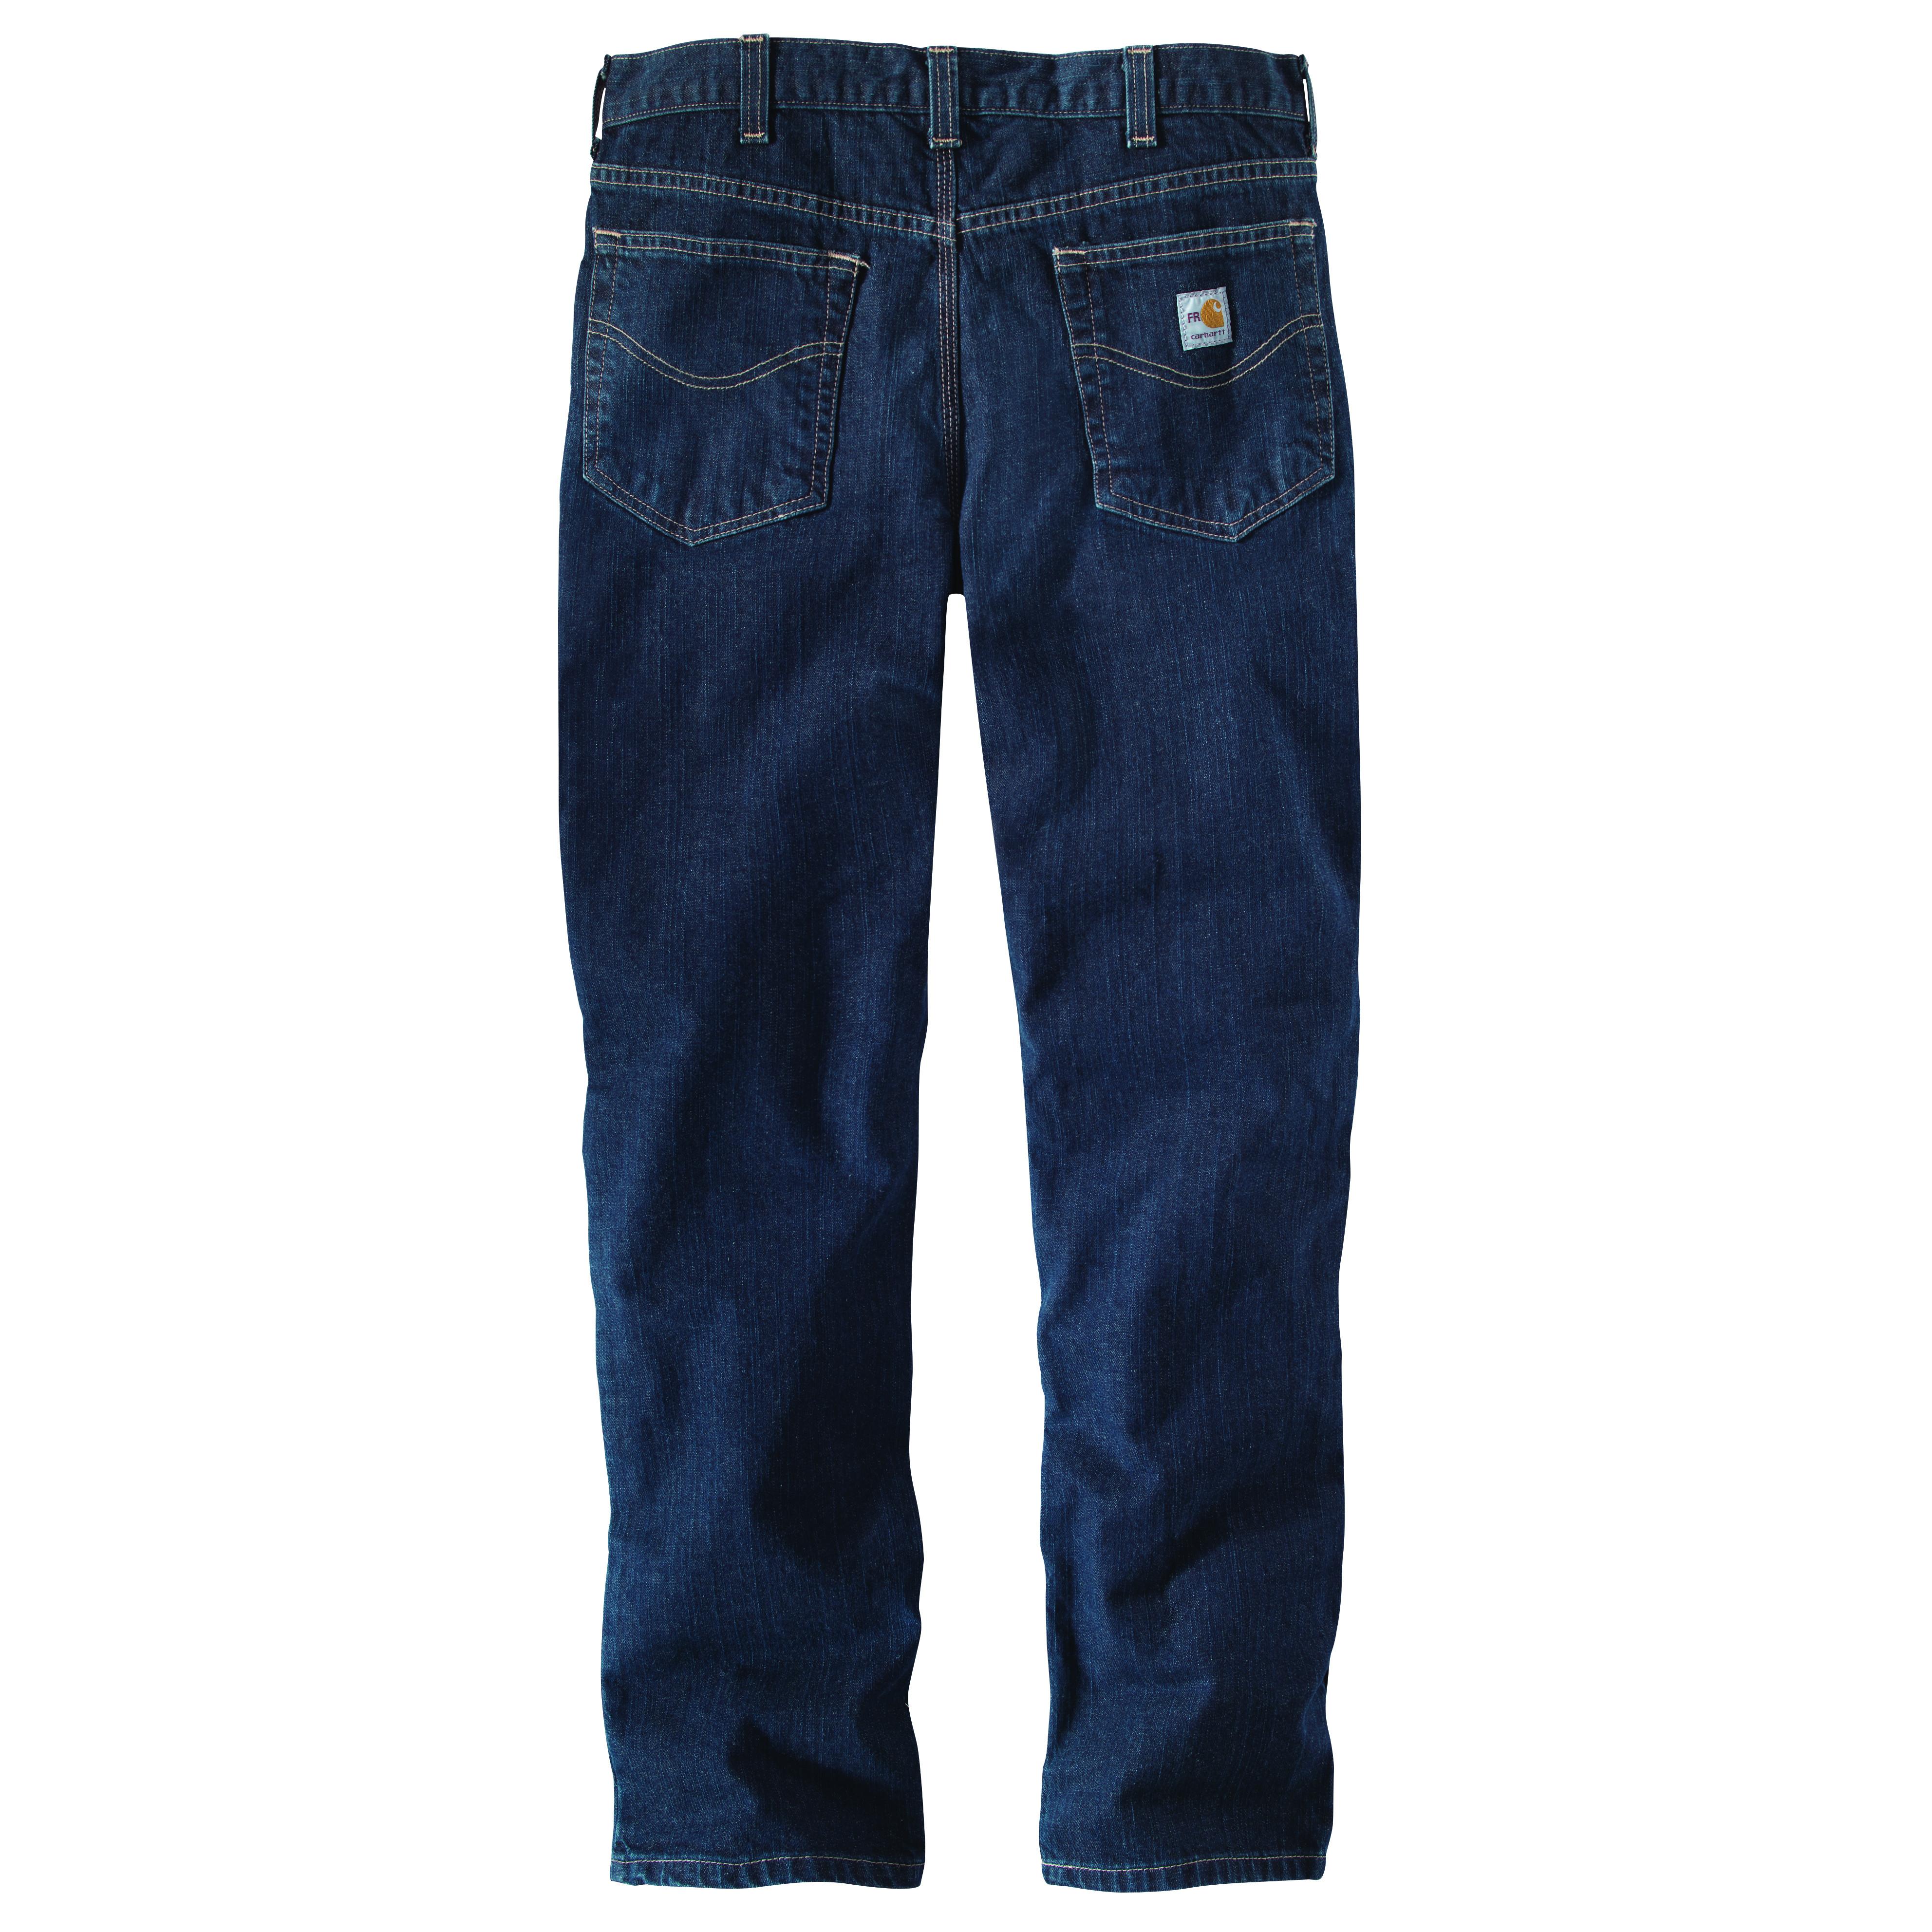 410937b2c613 FR jeans provide dual-hazard protection